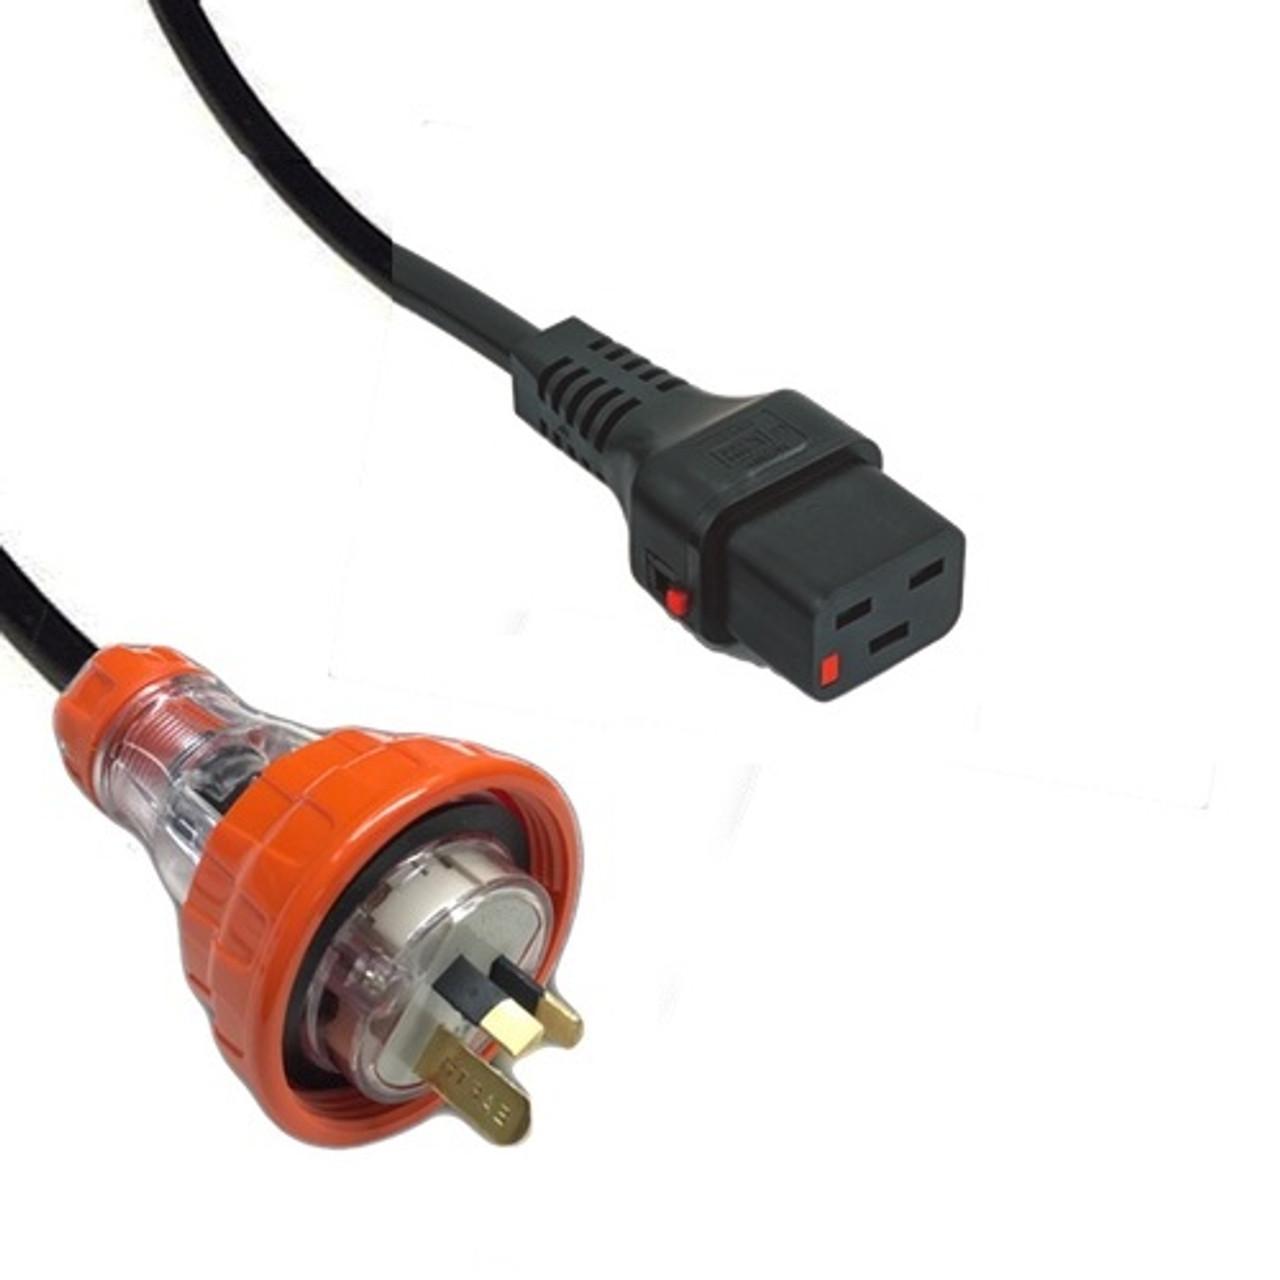 Captive (AS 3123) 15A [IP66] Flat Pin plug   >   IEC-Lock C19 16A socket